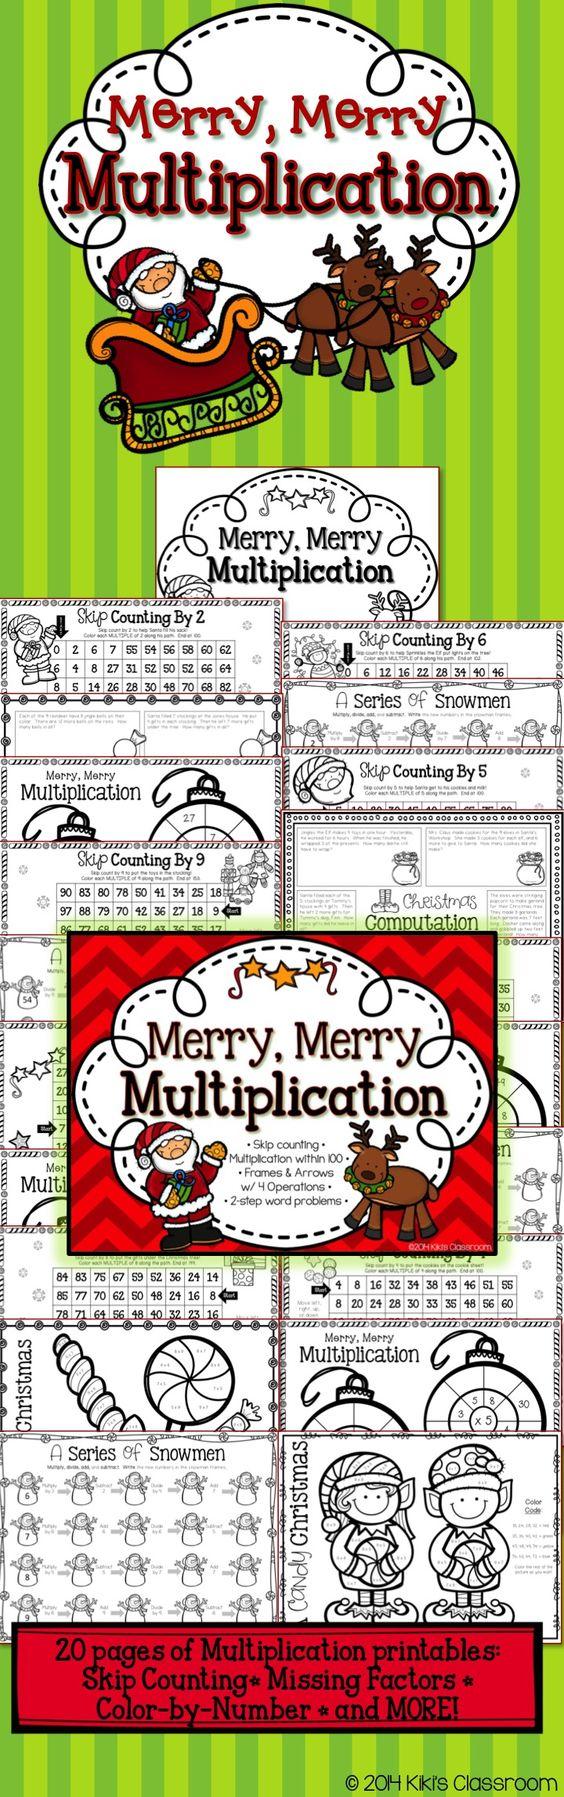 Third Grade Christmas Math 20 Fun Seasonal Multiplication Printables Cute And Engaging For The Christmas Third Grade Math Christmas Math Third Grade Math [ 1797 x 564 Pixel ]